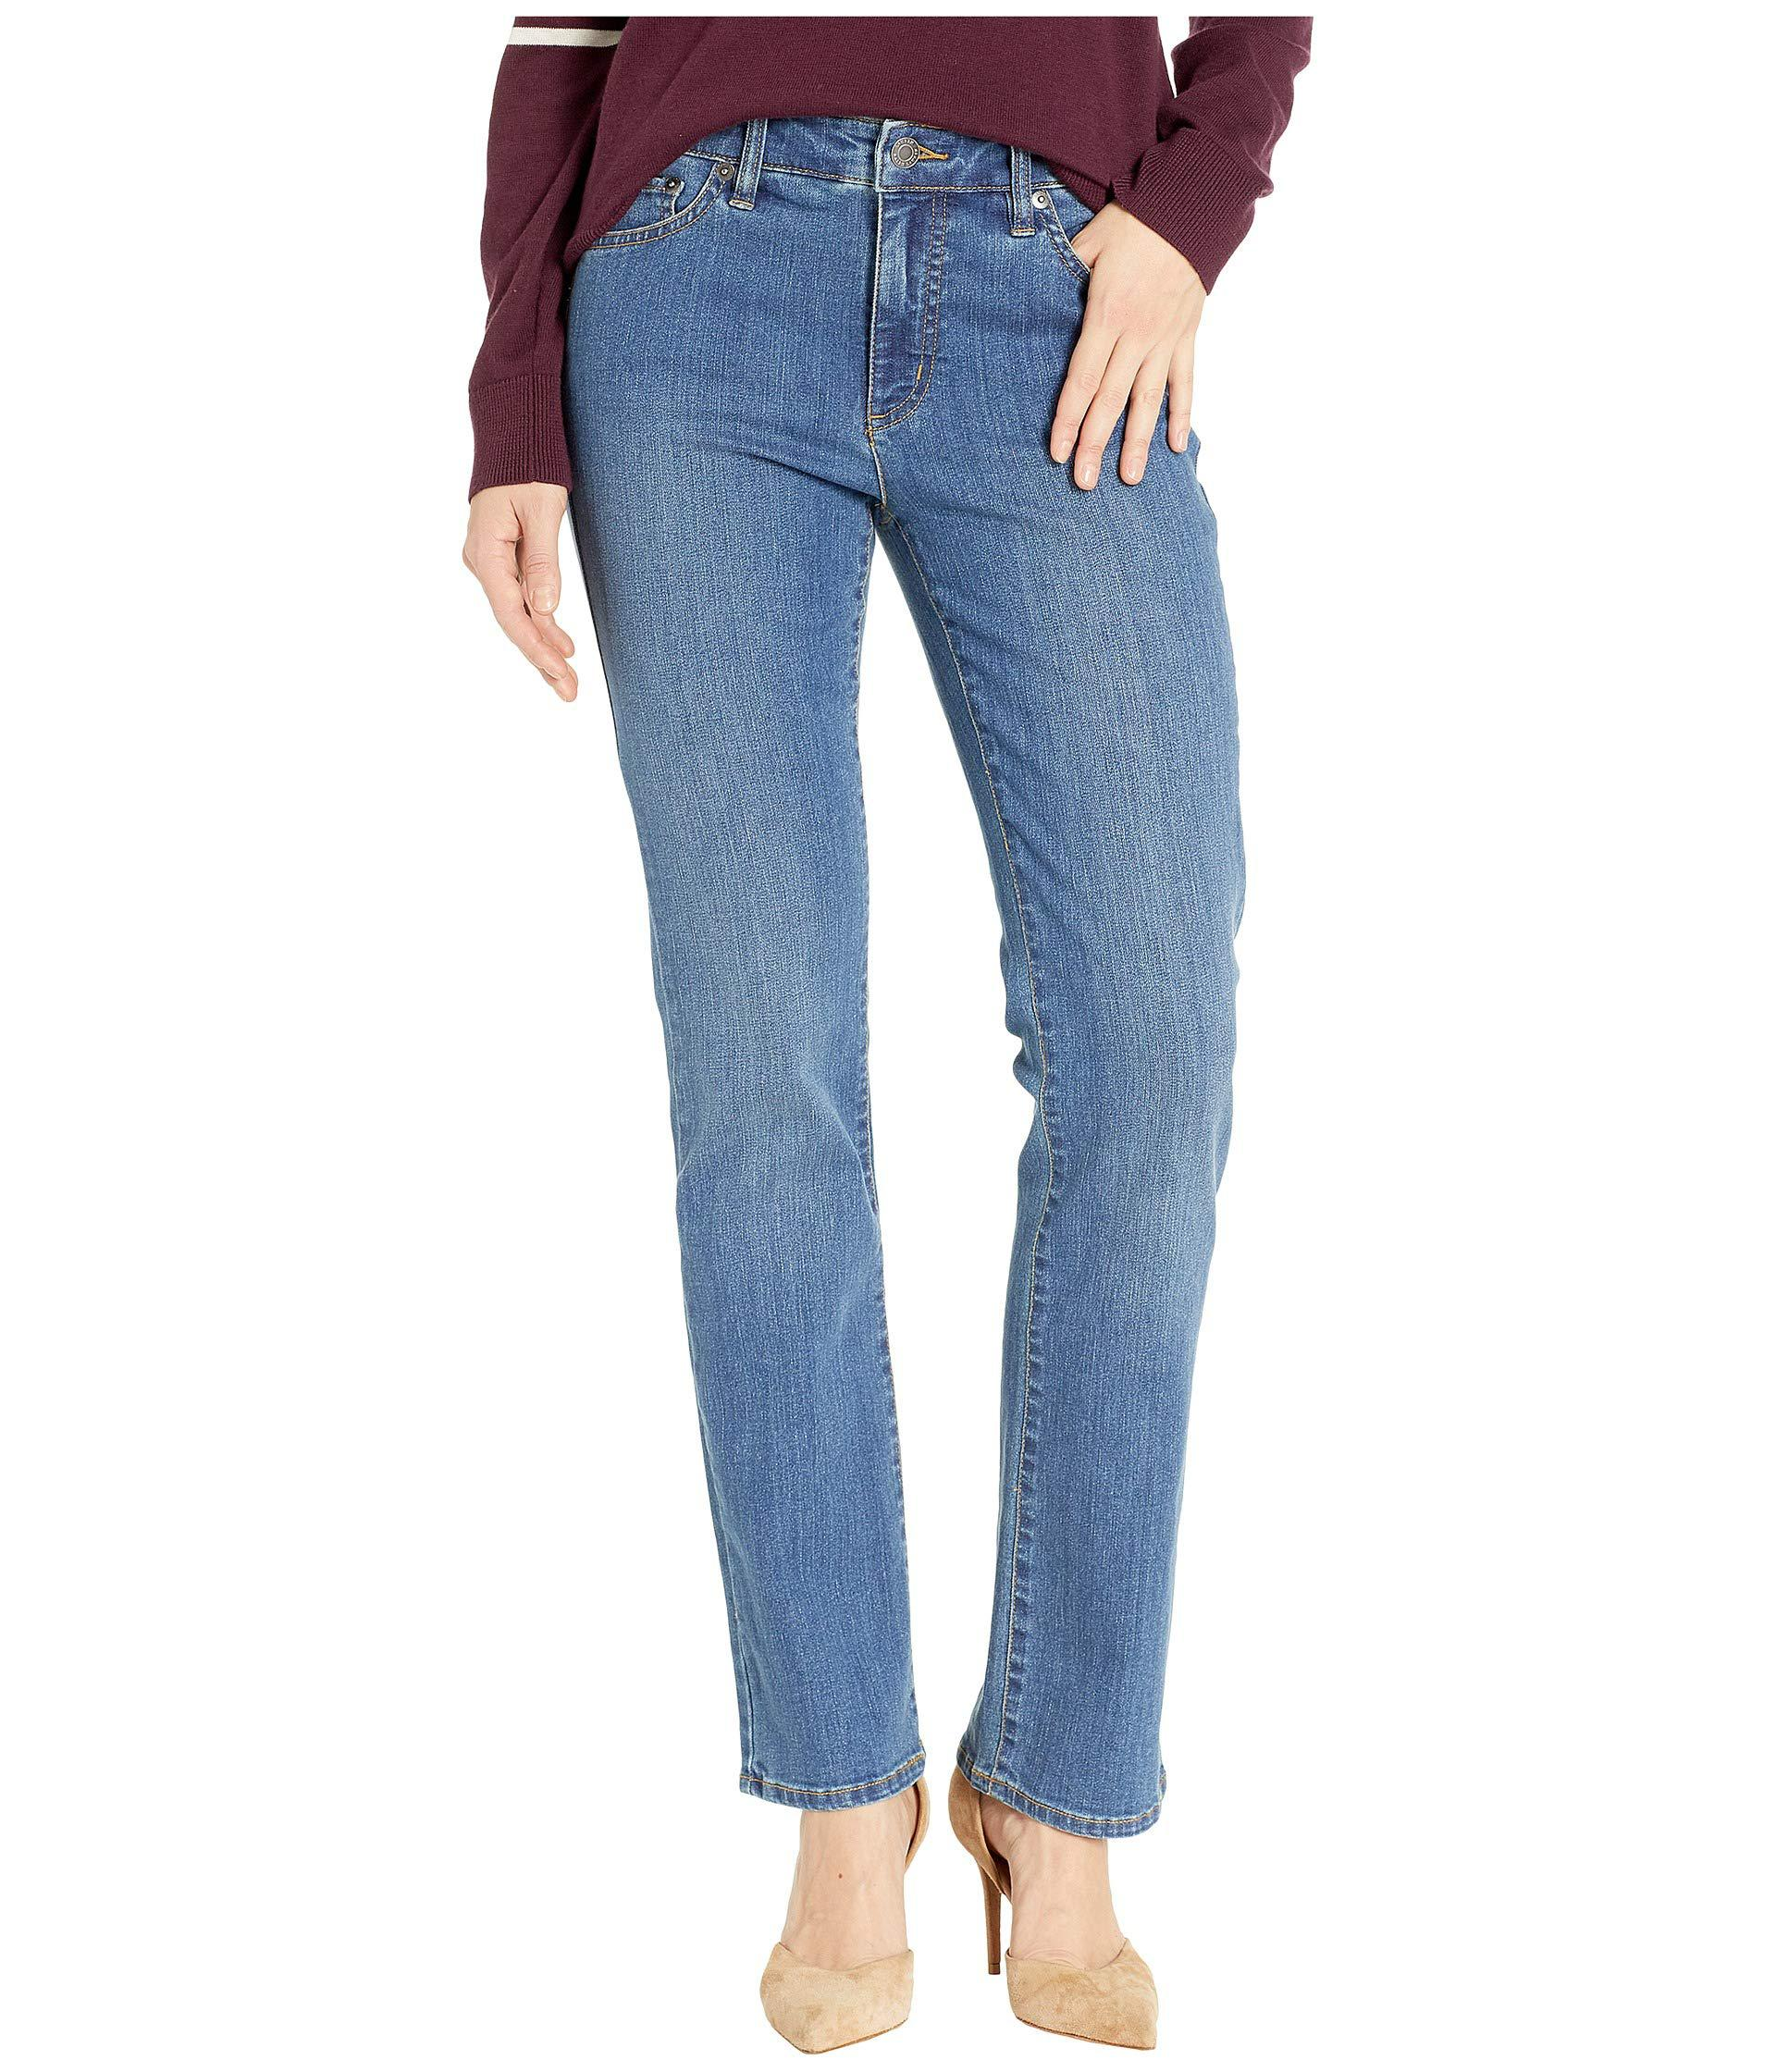 ca18cb9c991cc Lyst - Lauren By Ralph Lauren Premier Straight Jeans (ocean Blue ...